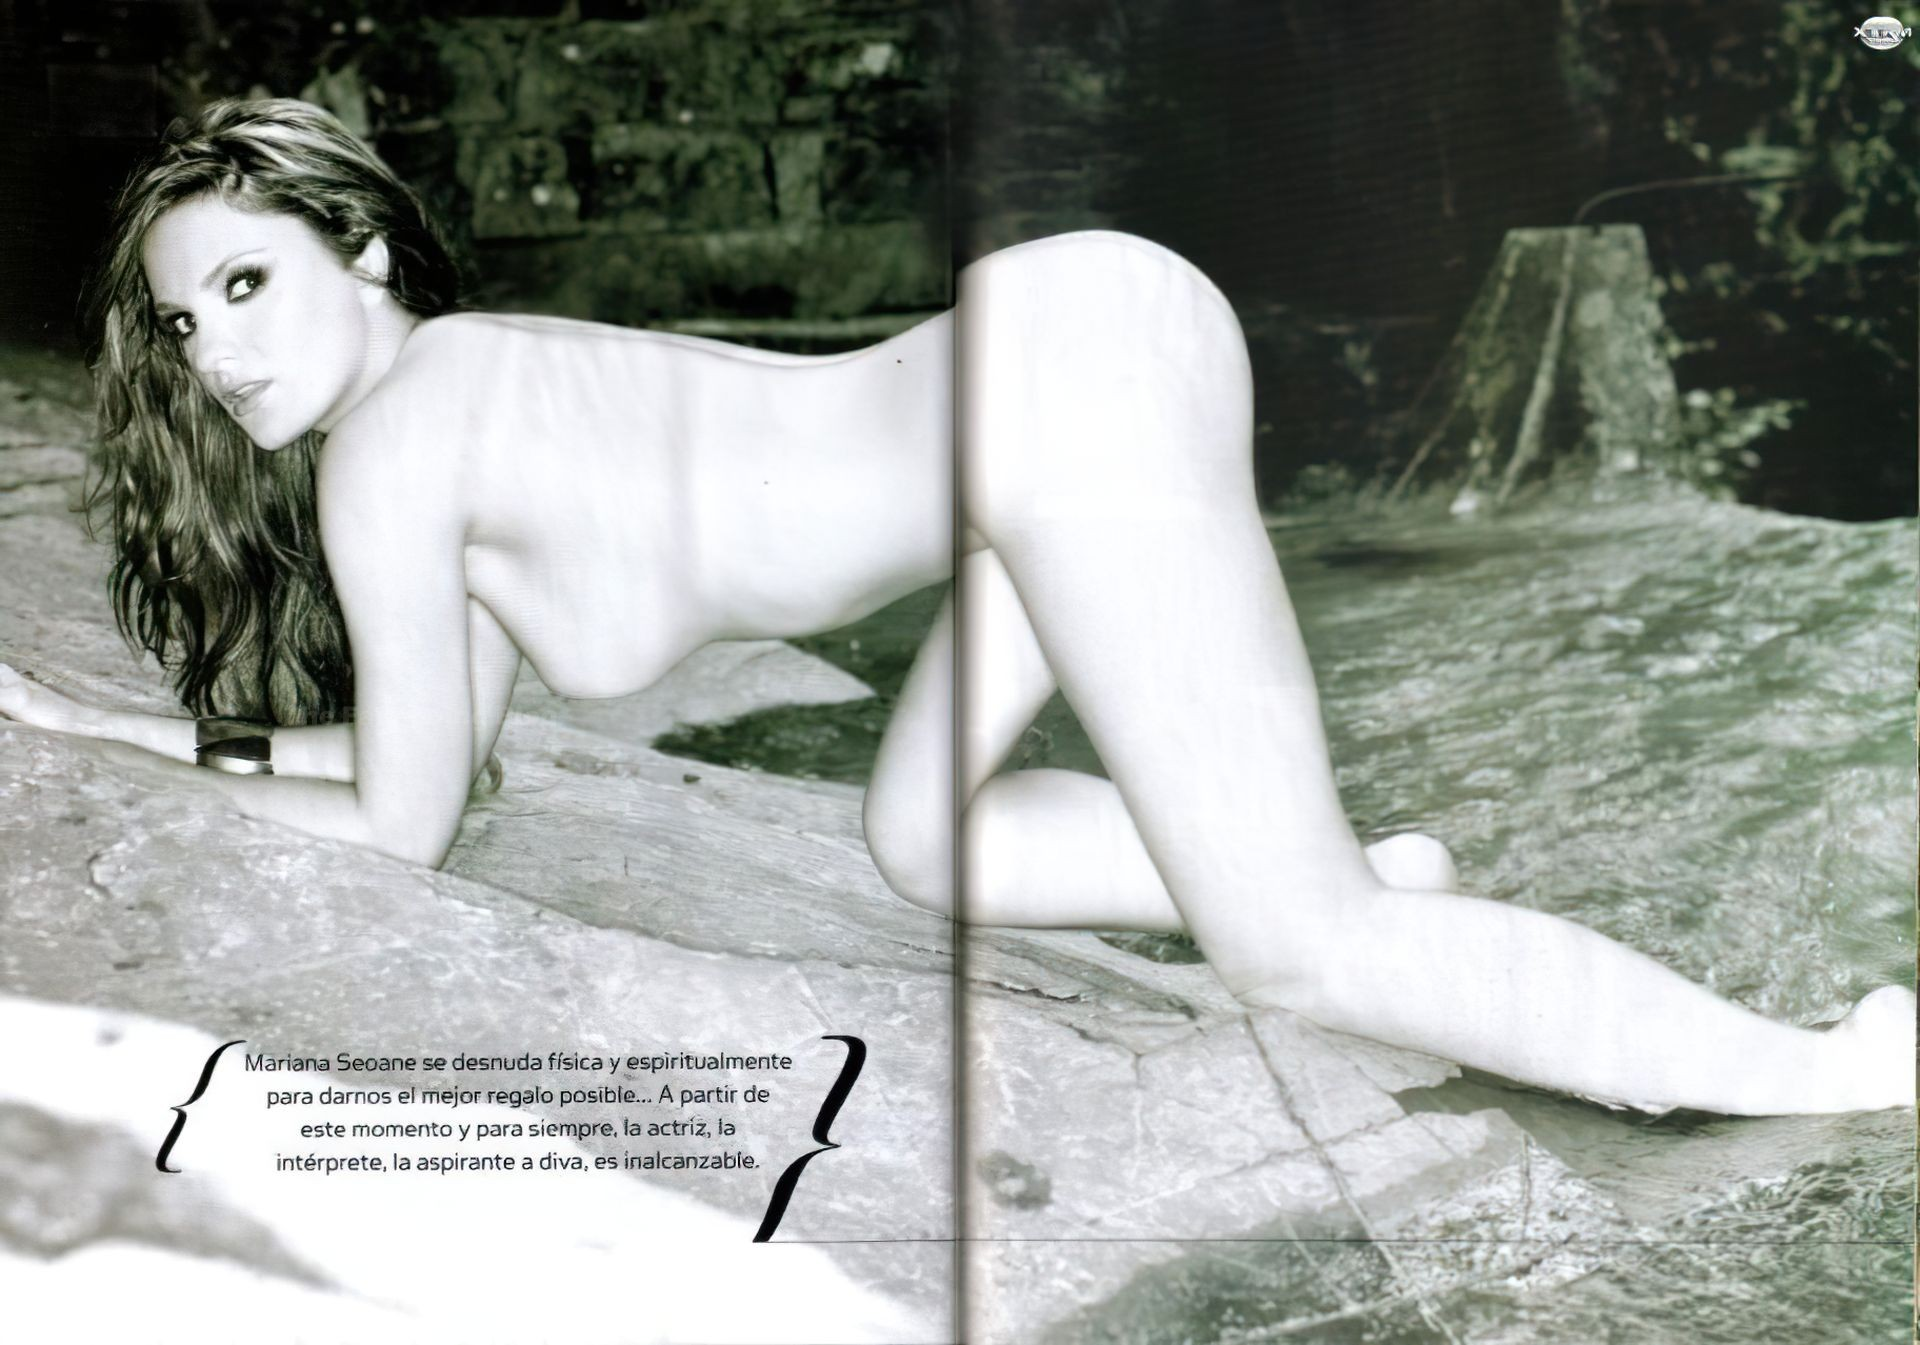 Mariana seoane fake xxx domination porn pics